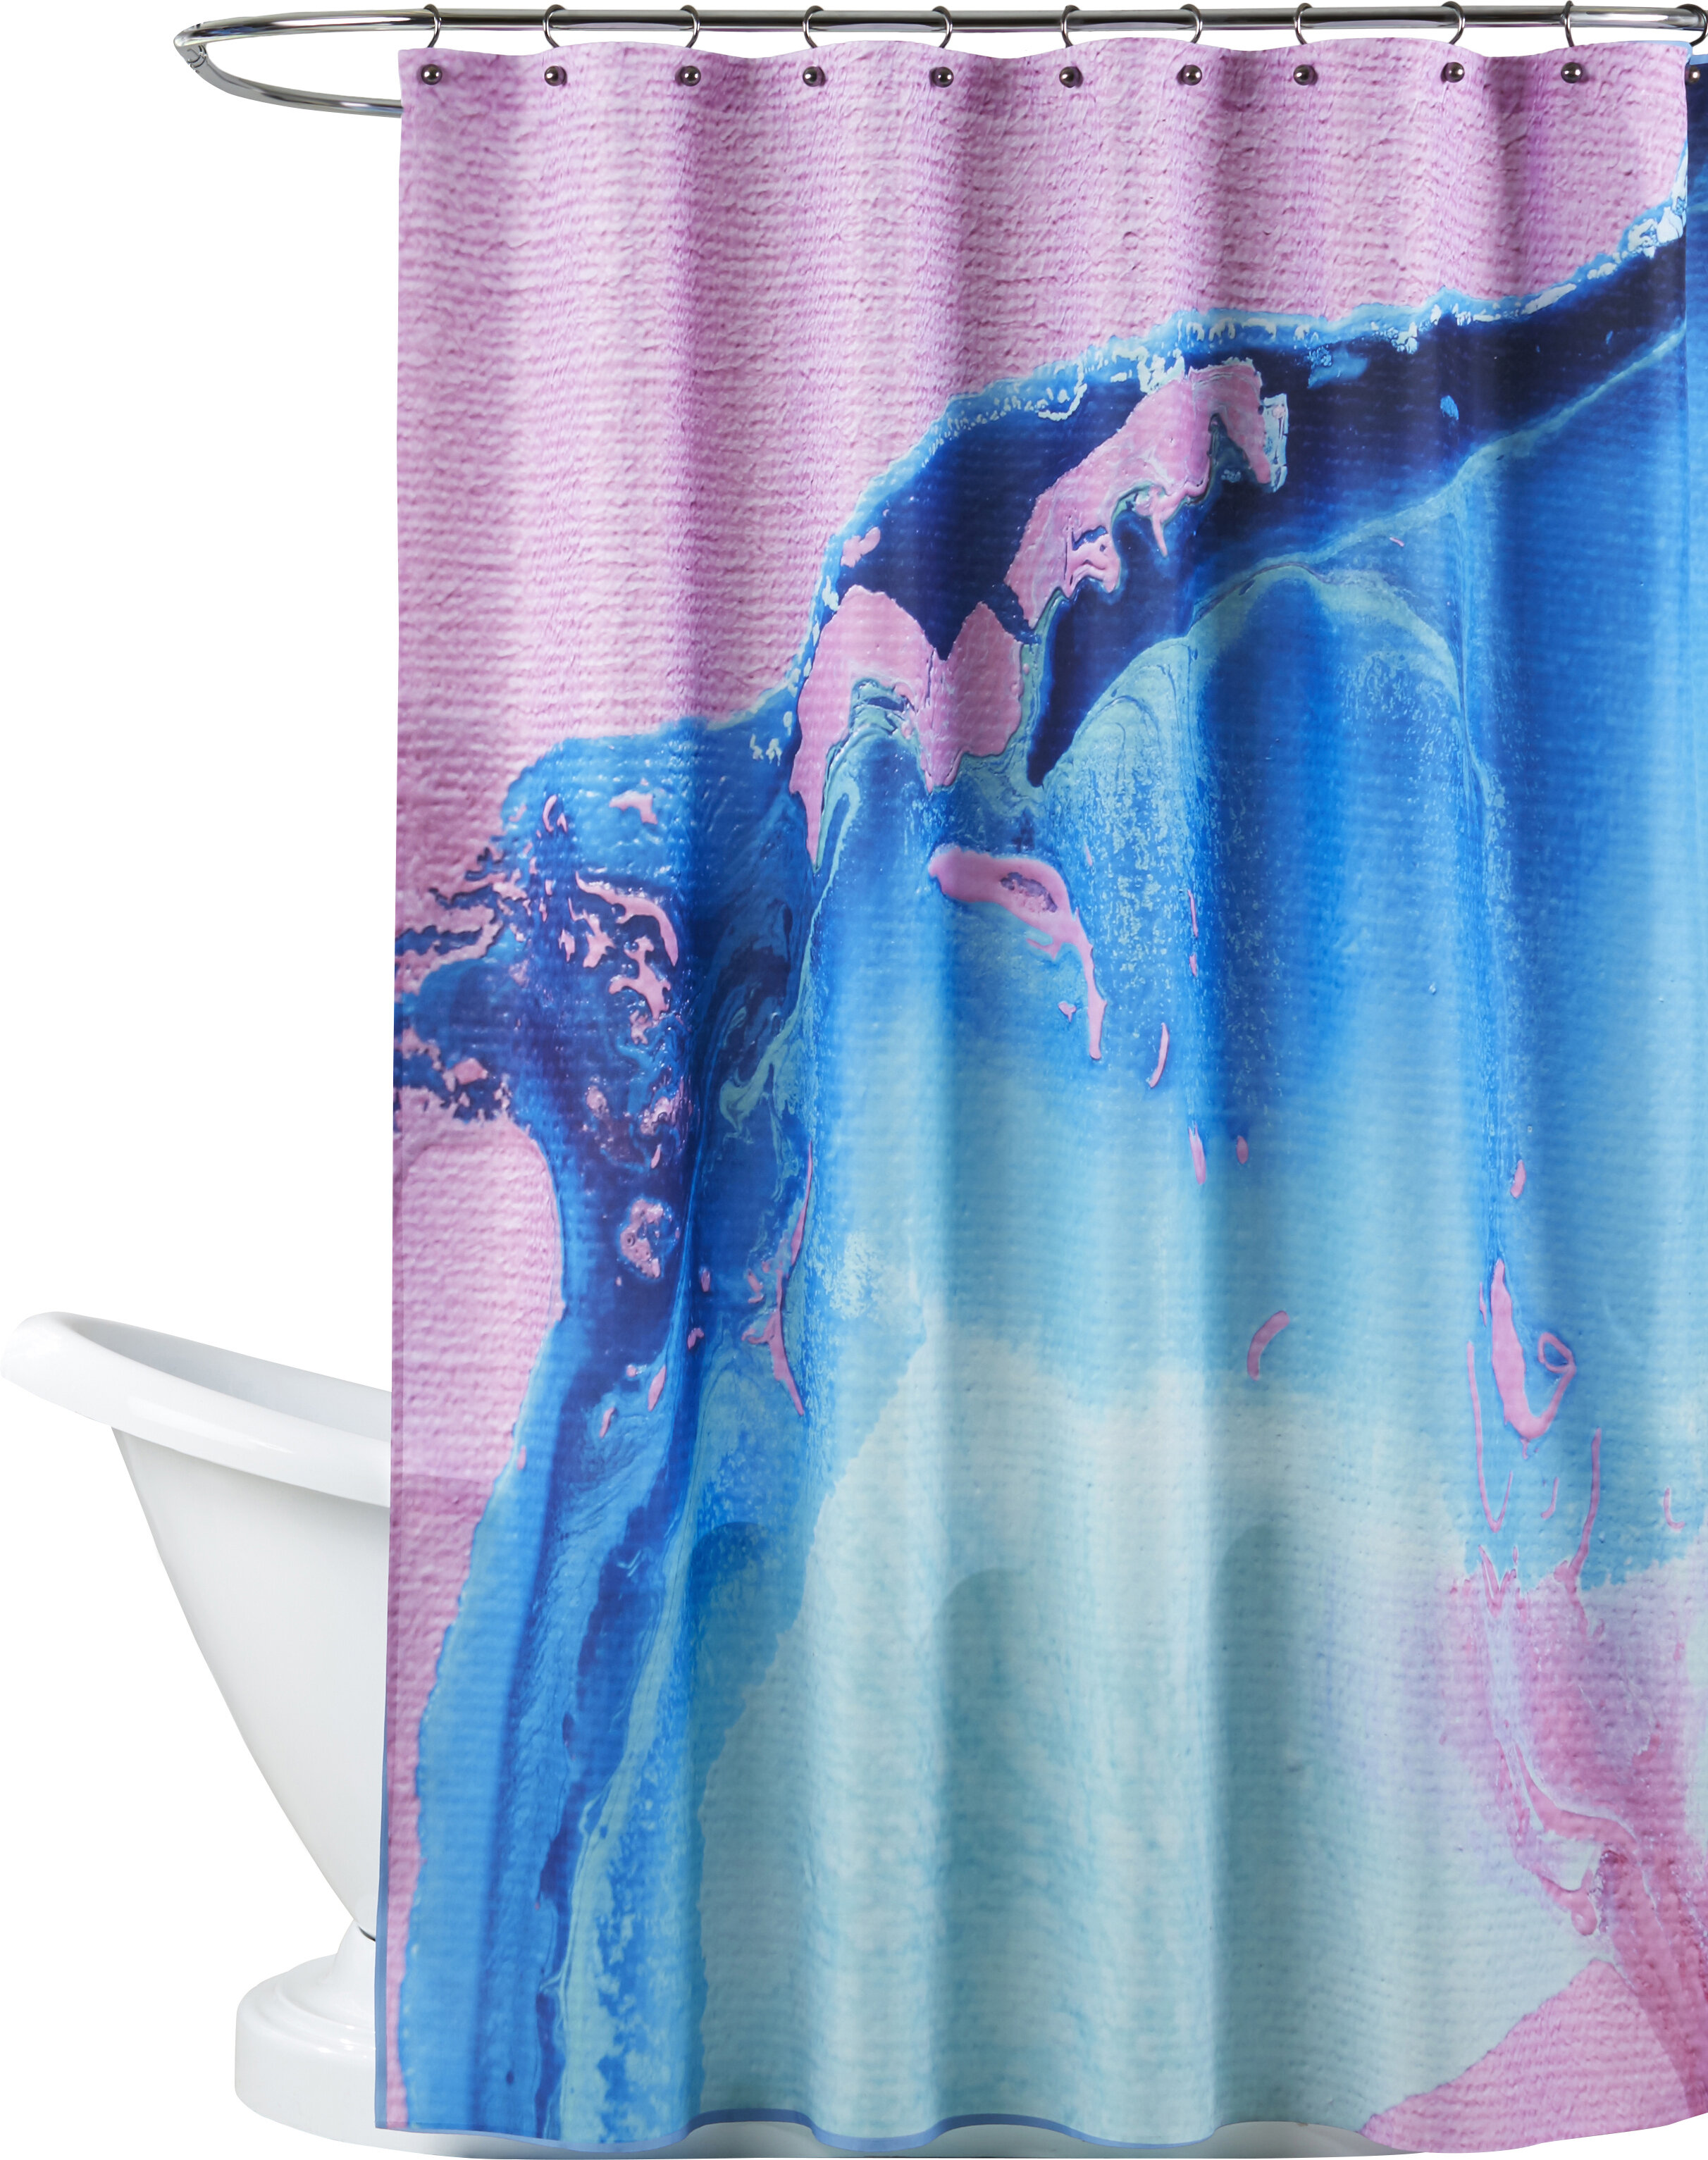 Brayden Studio Deb Mcnaughton Blur Single Shower Curtain Wayfair